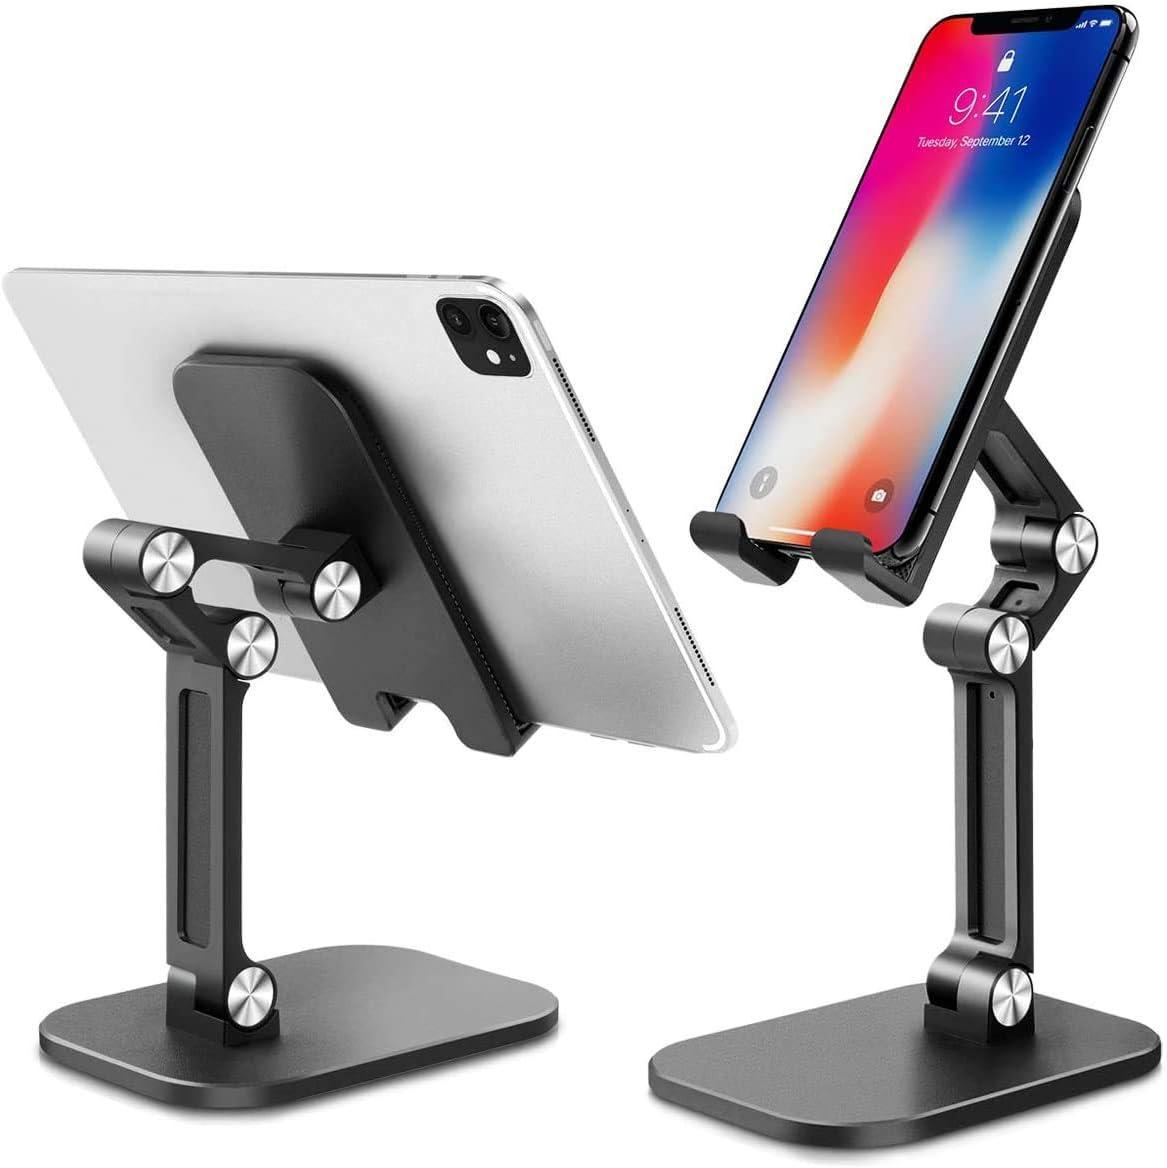 Soporte Movil, Soporte Tablet, Multi-Angulo Soporte Movil Escritorio Plegable, Soporte para Movil Compatible con iPhone X/XS/XS MAX/XR/8/7, Tablet, iPad, Samsung S8 S7, Huawei, Otras Smartphones